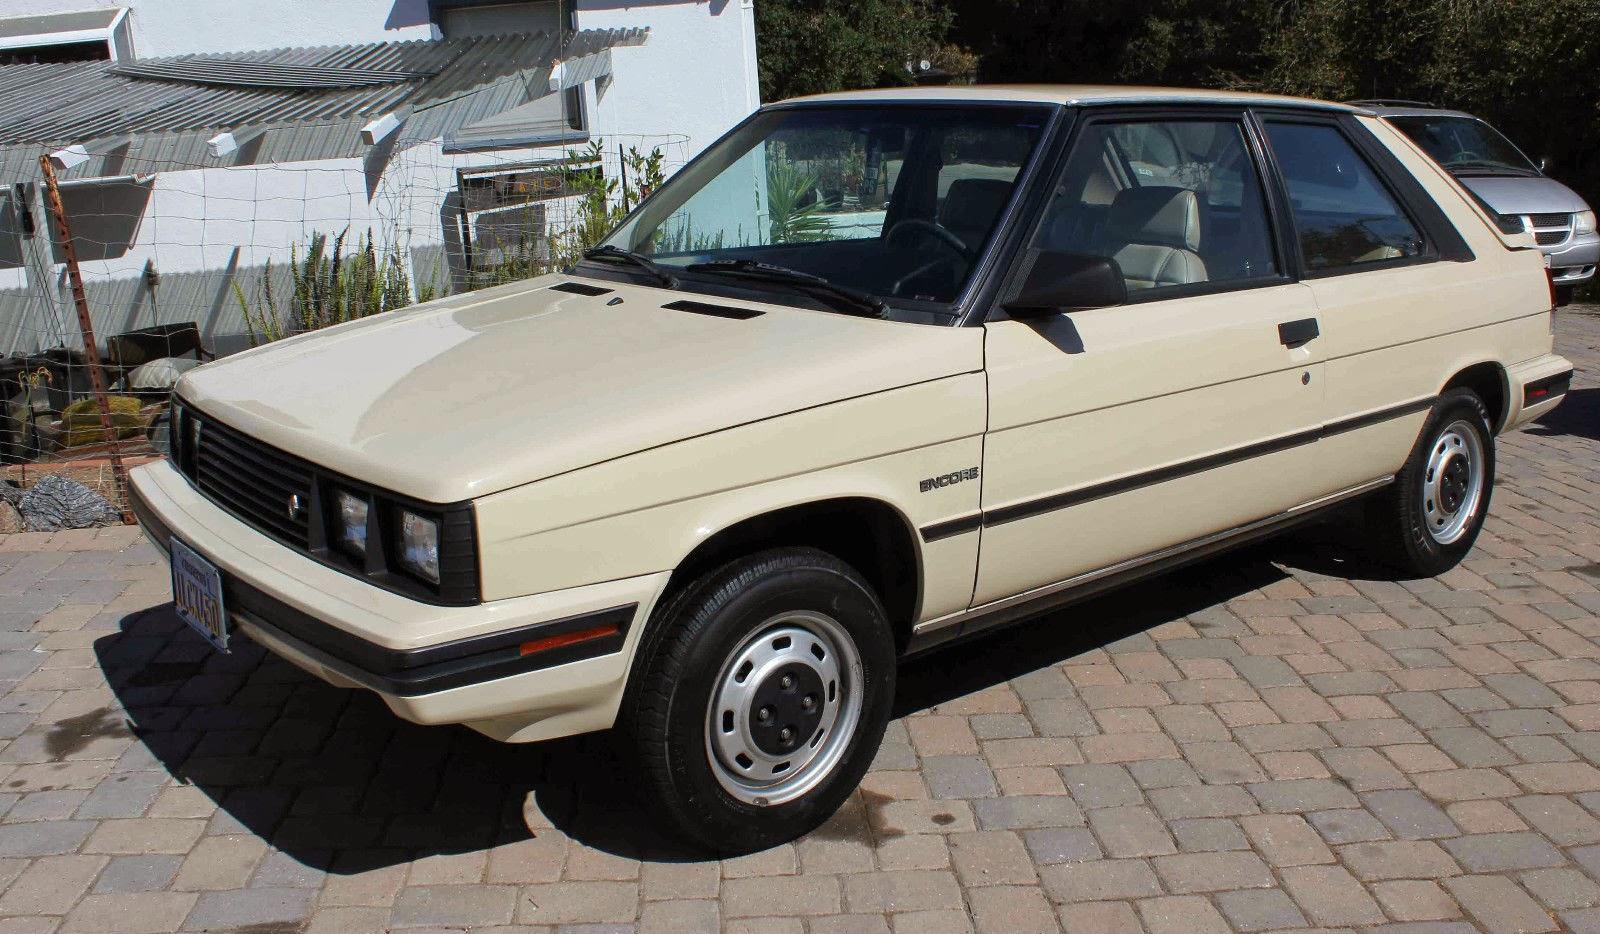 1987 Renault Alliance GTA | Bring a Trailer